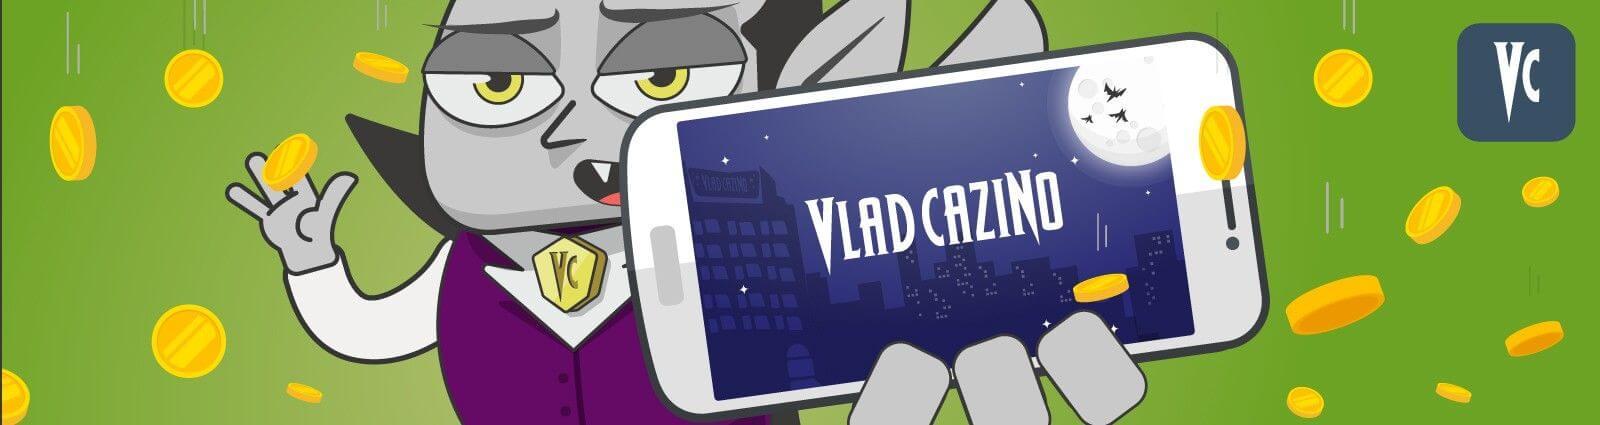 Aplicația mobilă Vlad Cazino